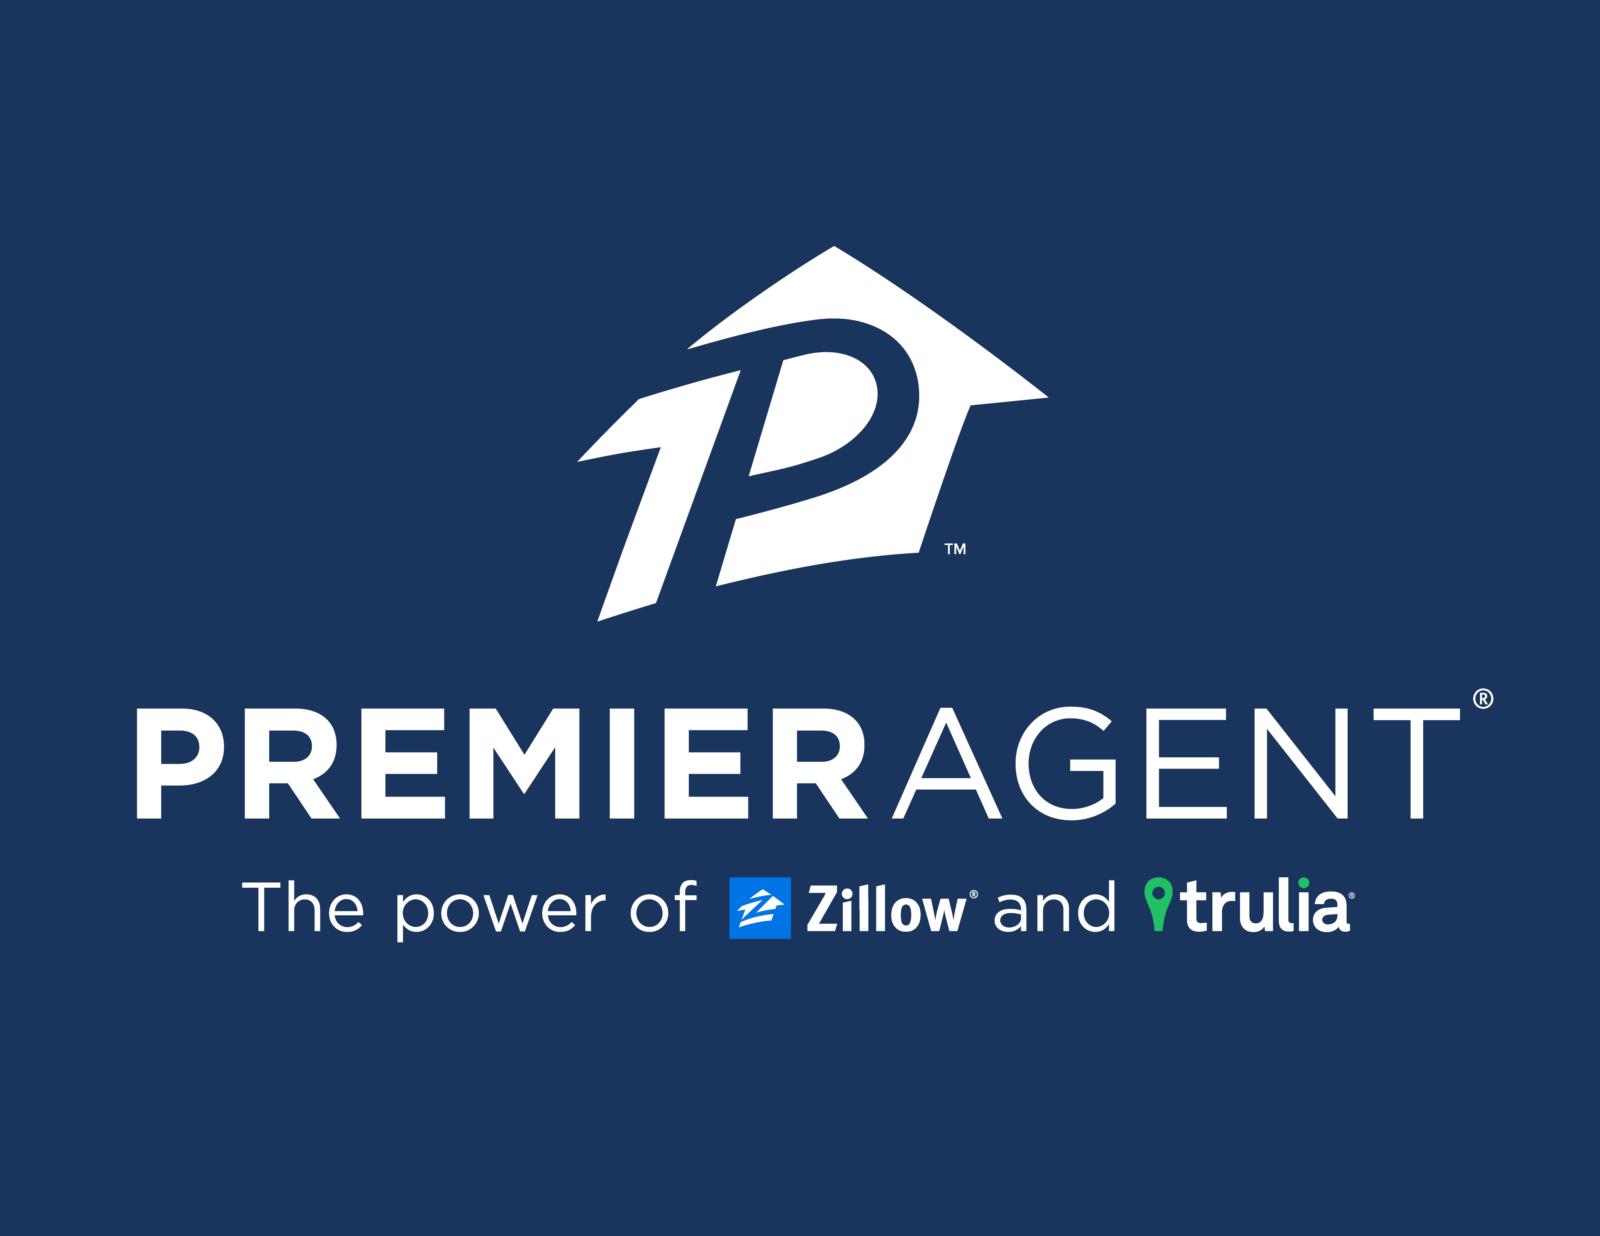 PremierAgenct-Zillow-and-Trulia.jpg